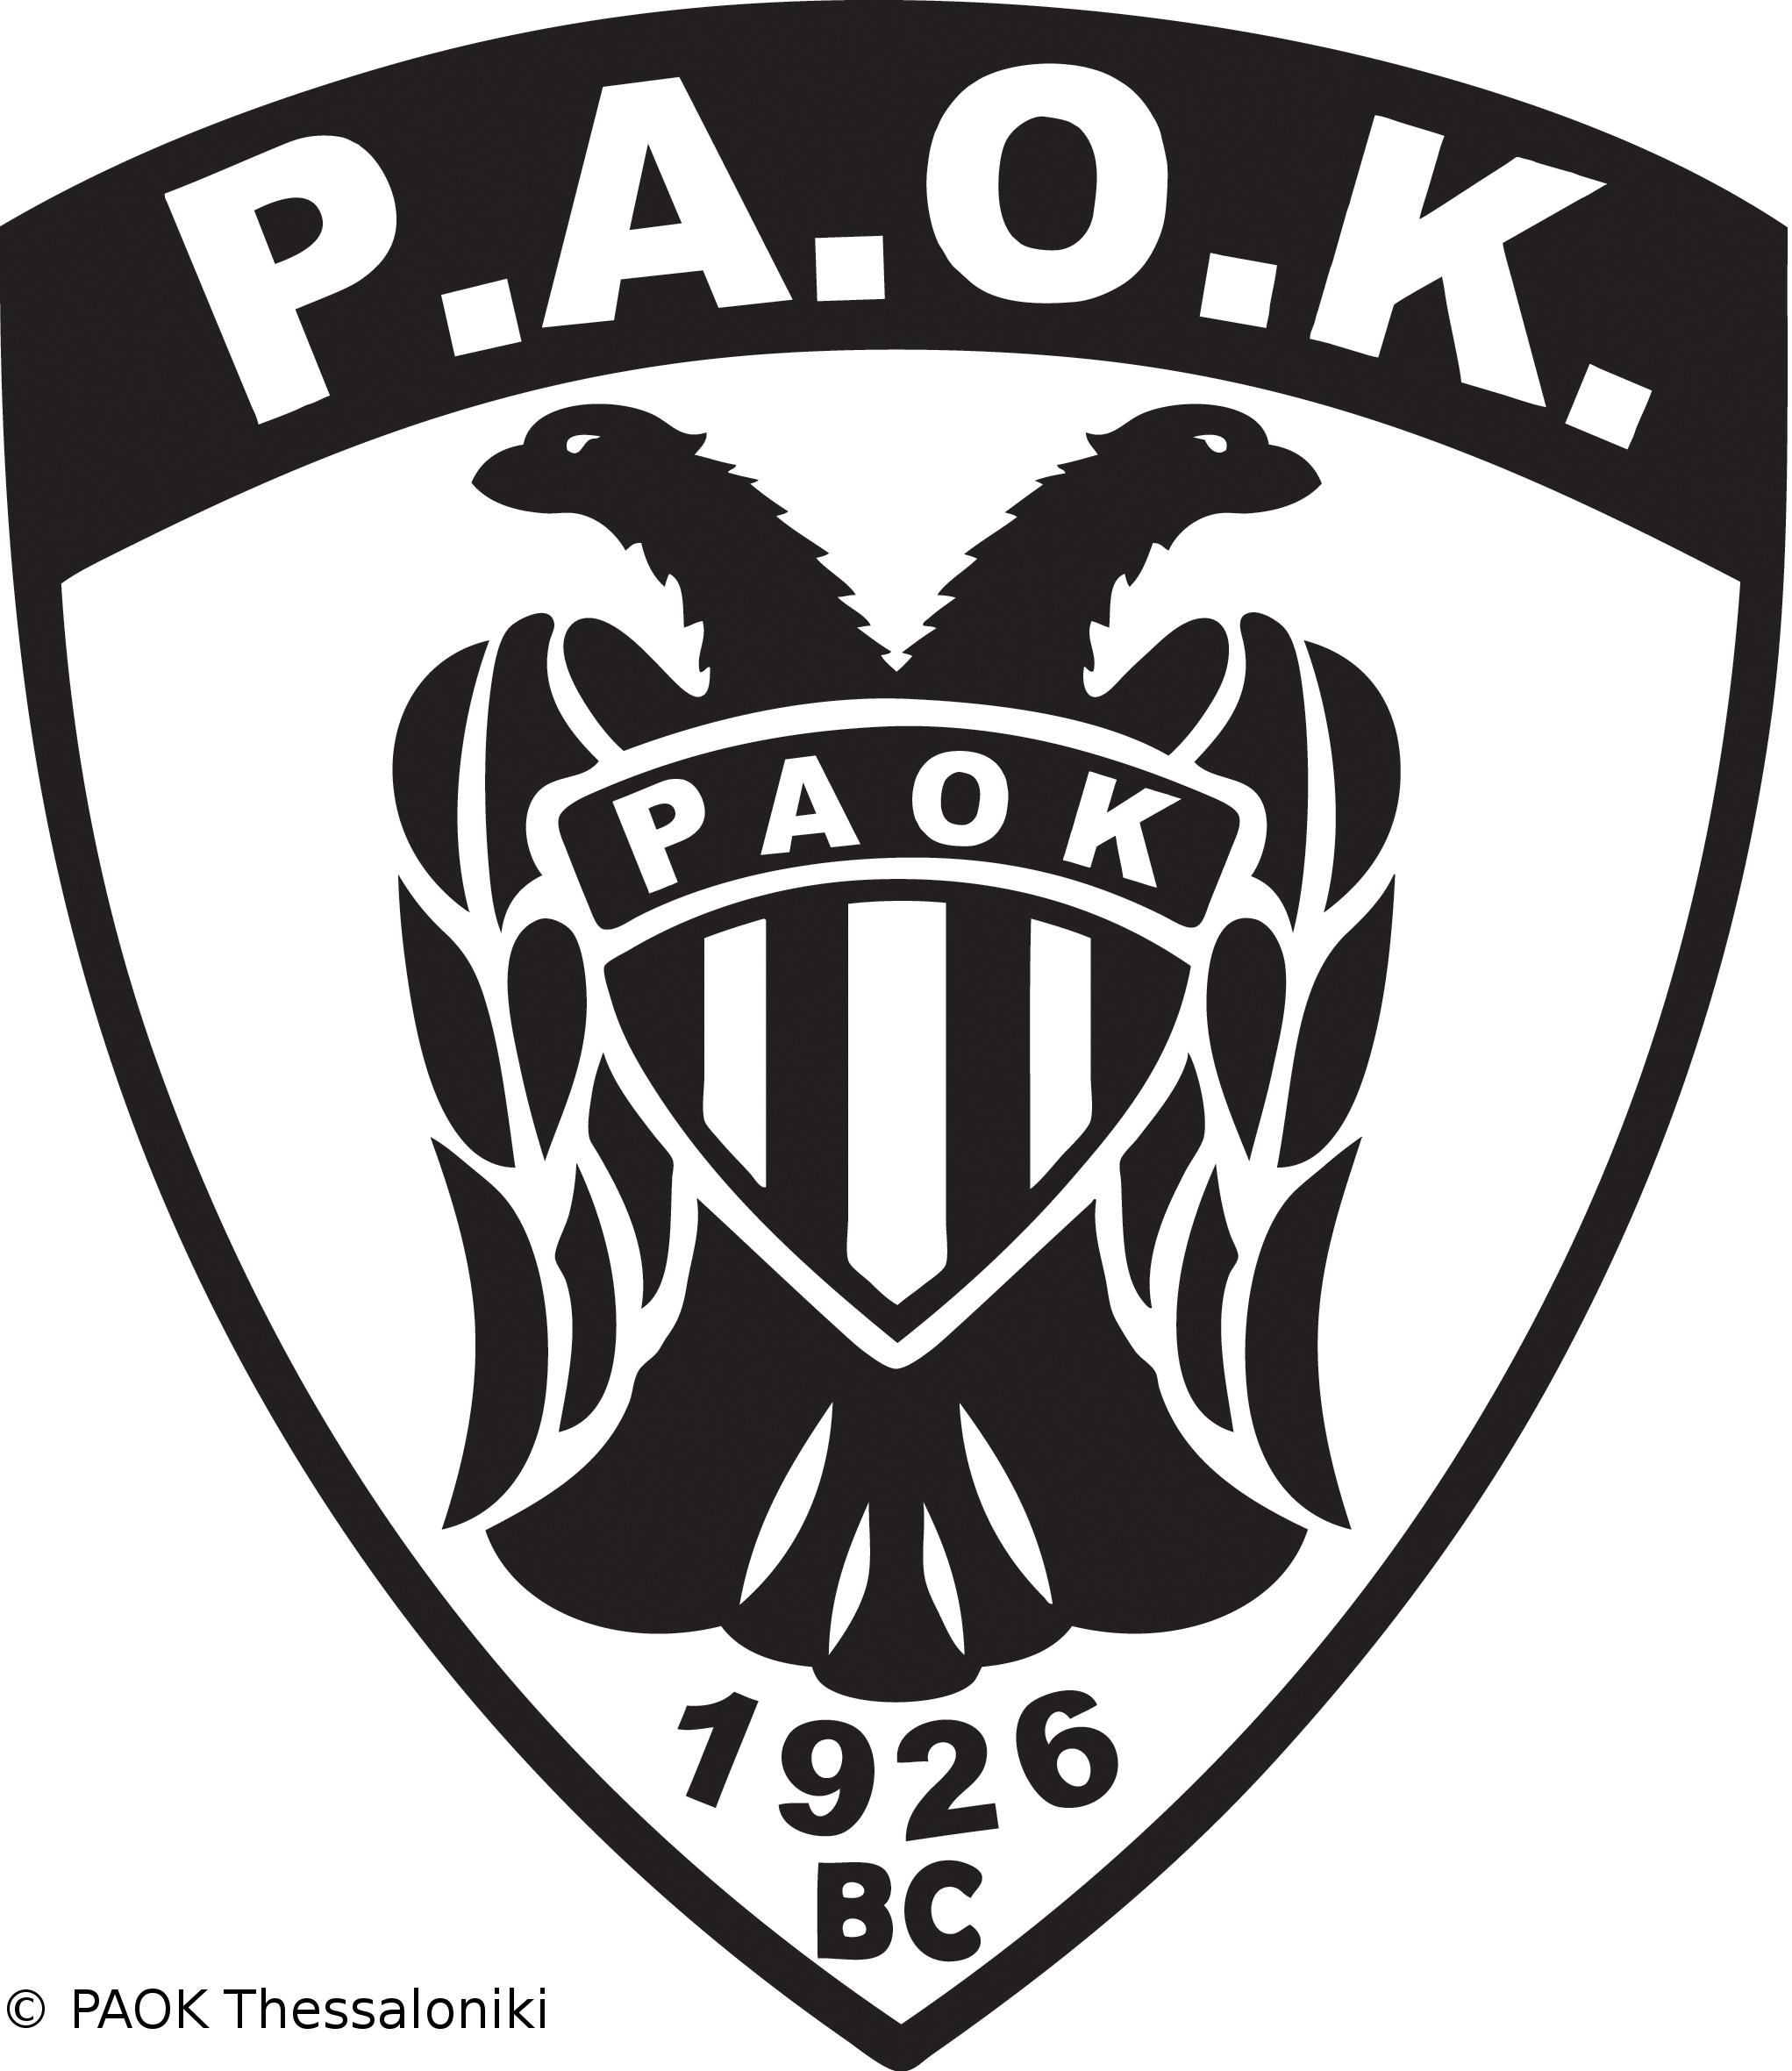 PAOK verlängert Vertrag mit Sofoklis Schortsanitis